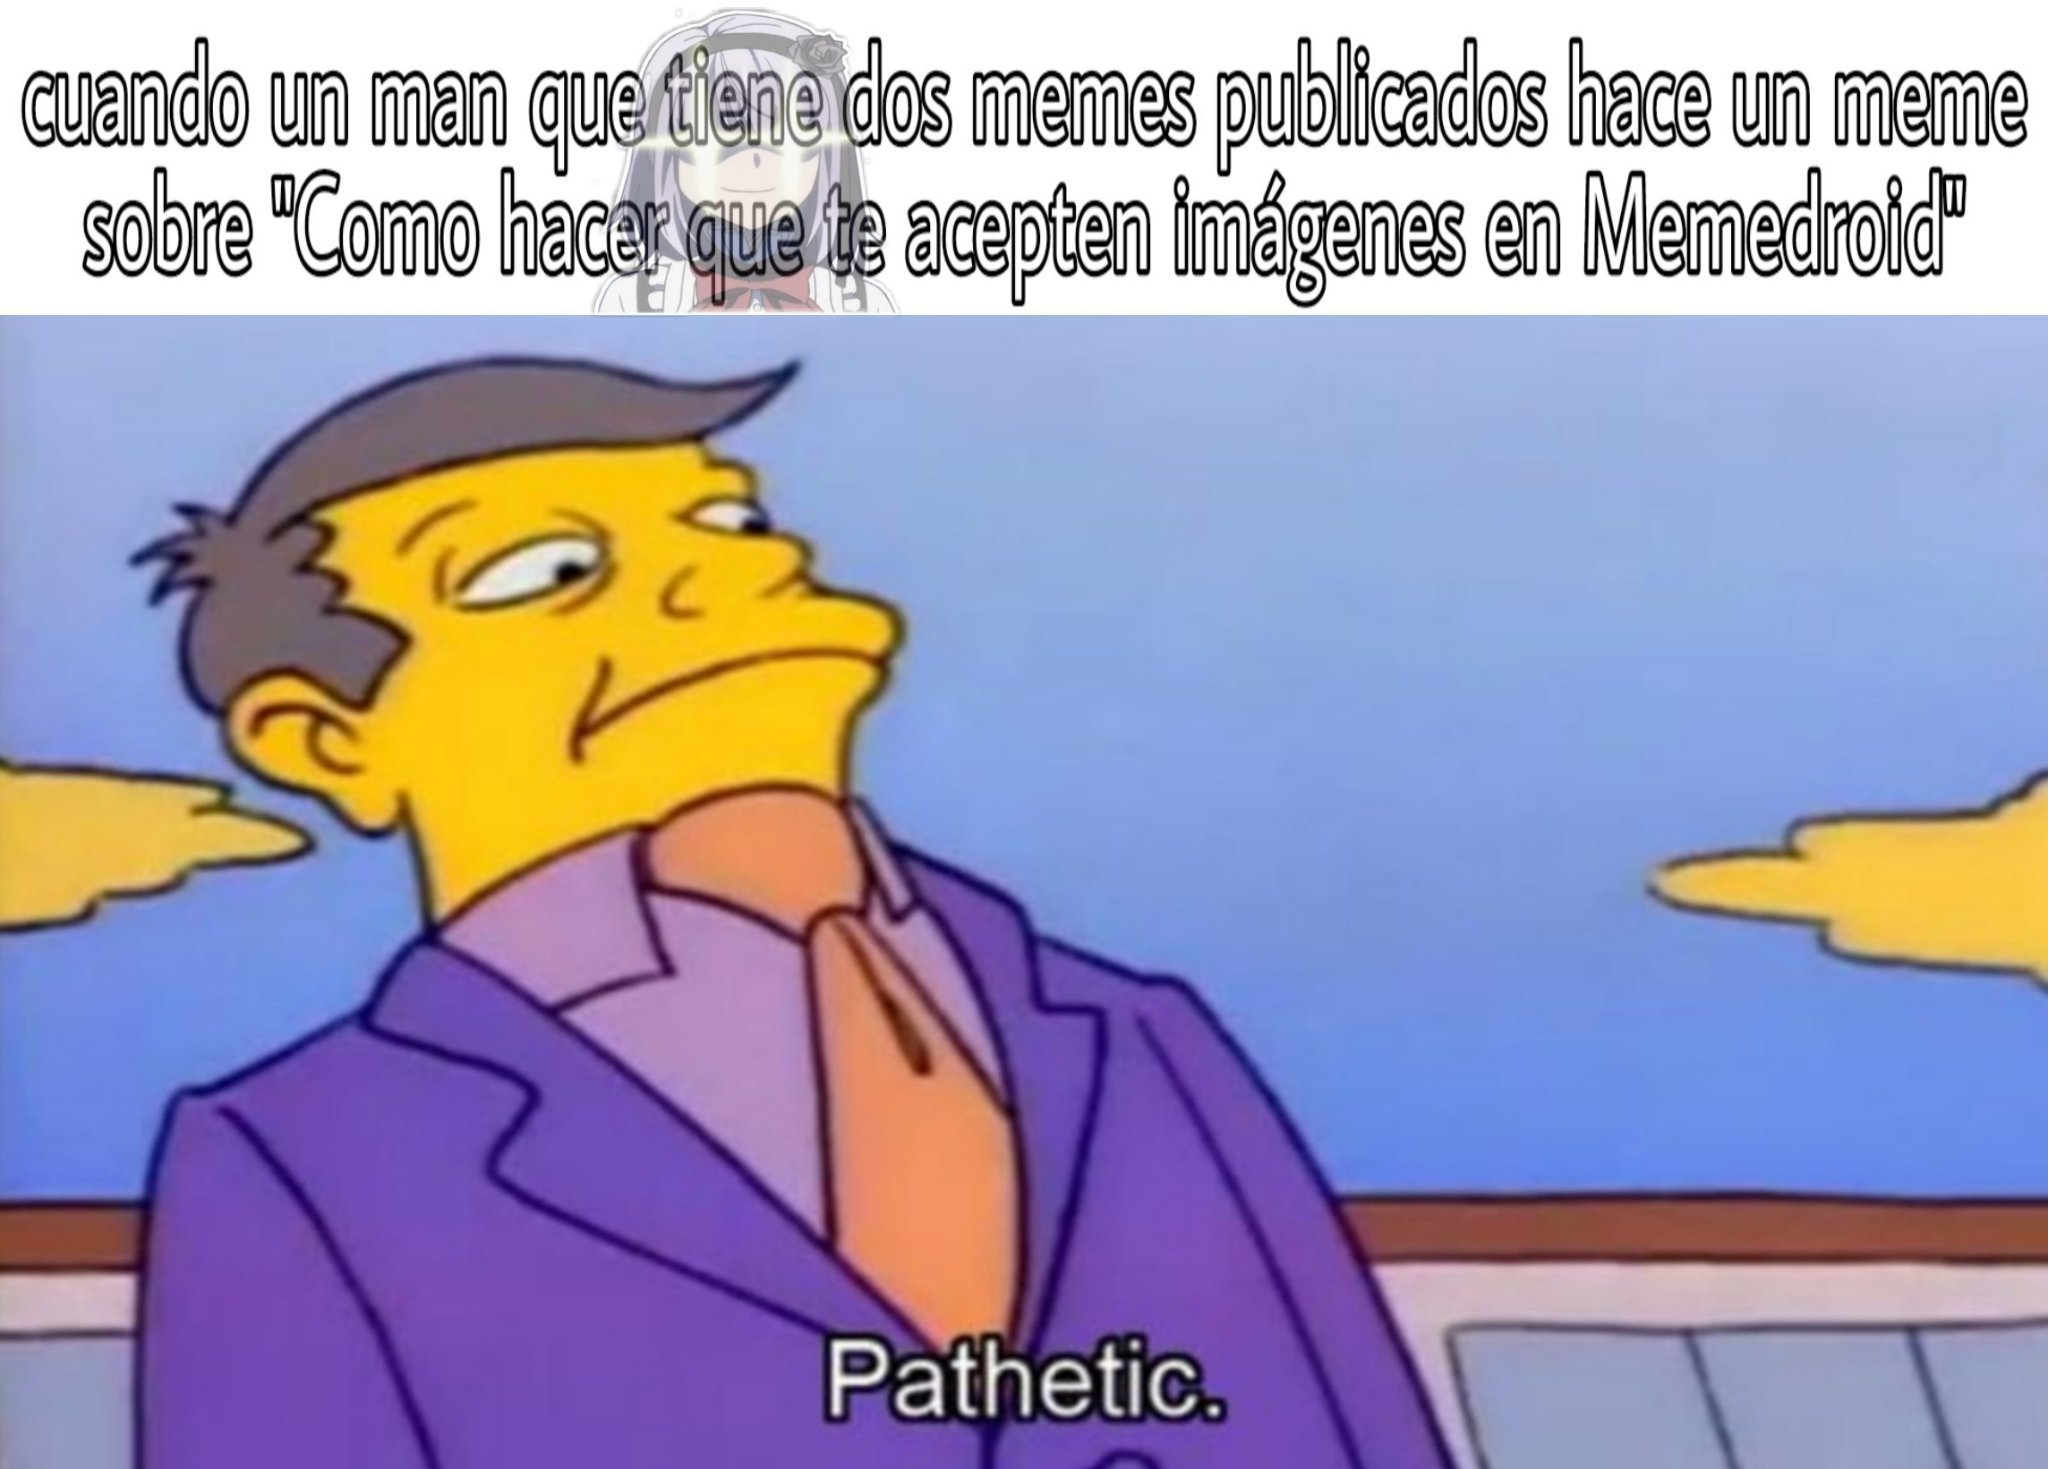 no me involucro con el micro - meme